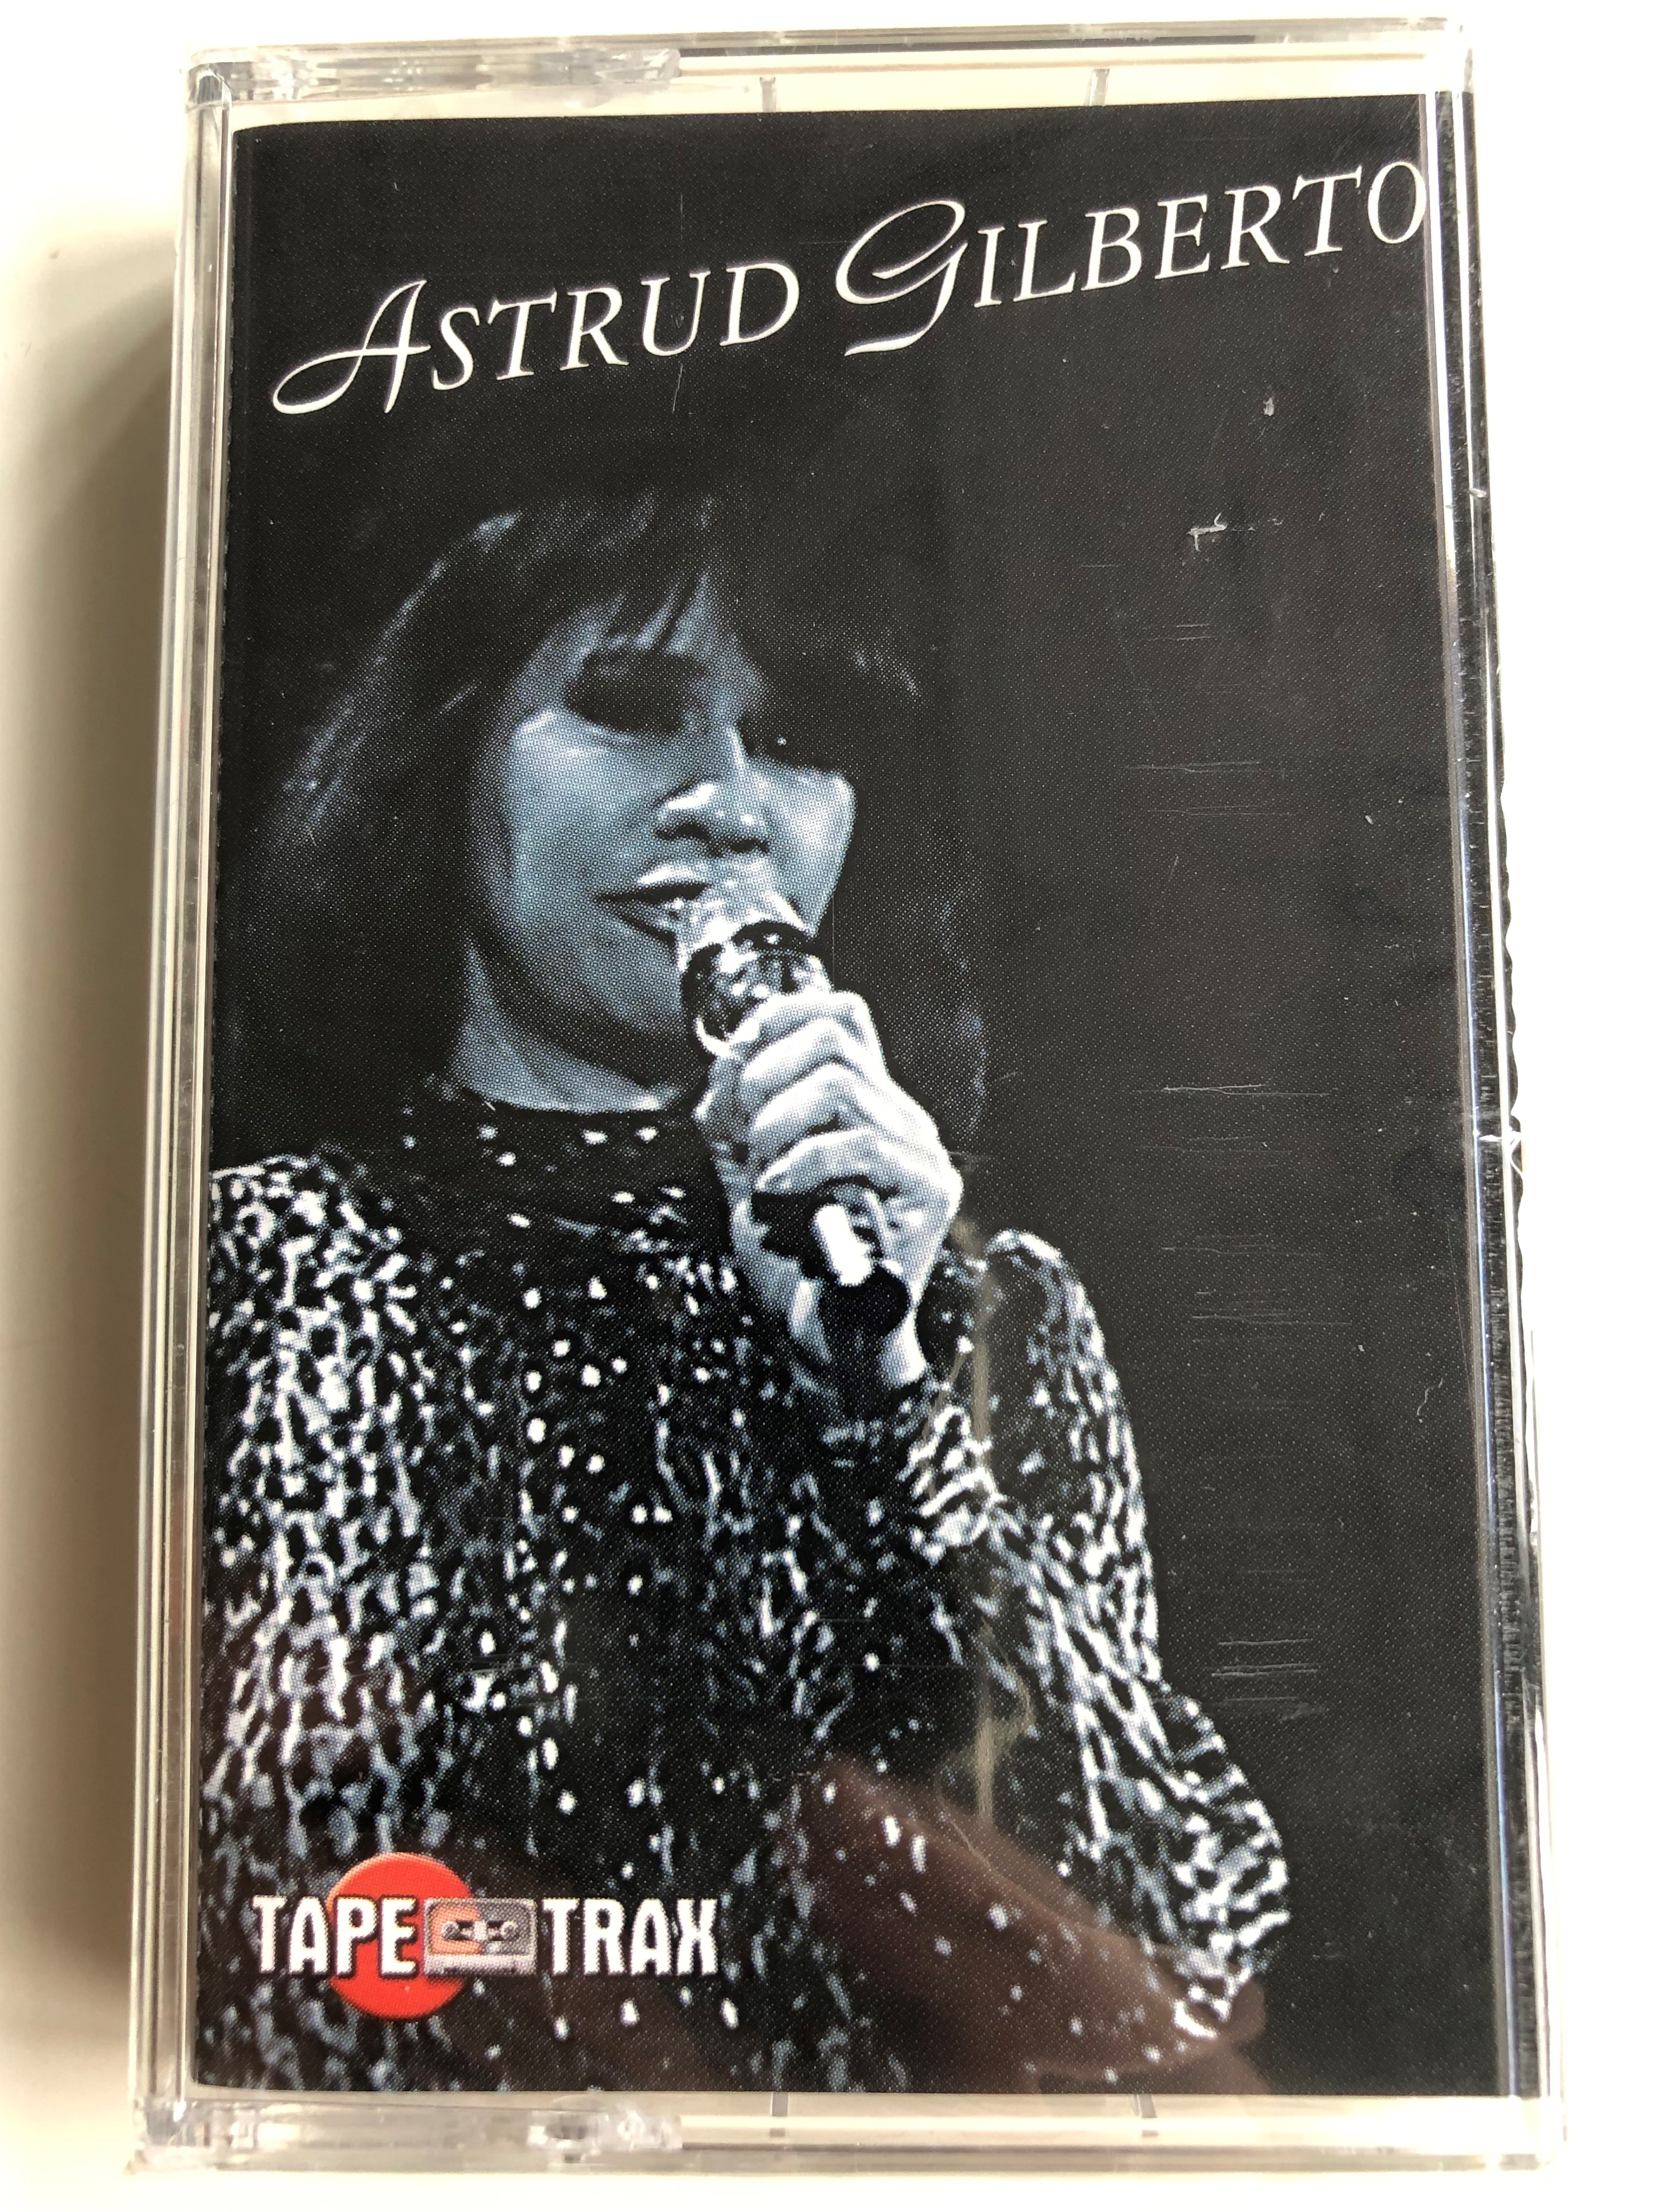 astrud-gilberto-tape-trax-audio-cassette-tt20112-1-.jpg